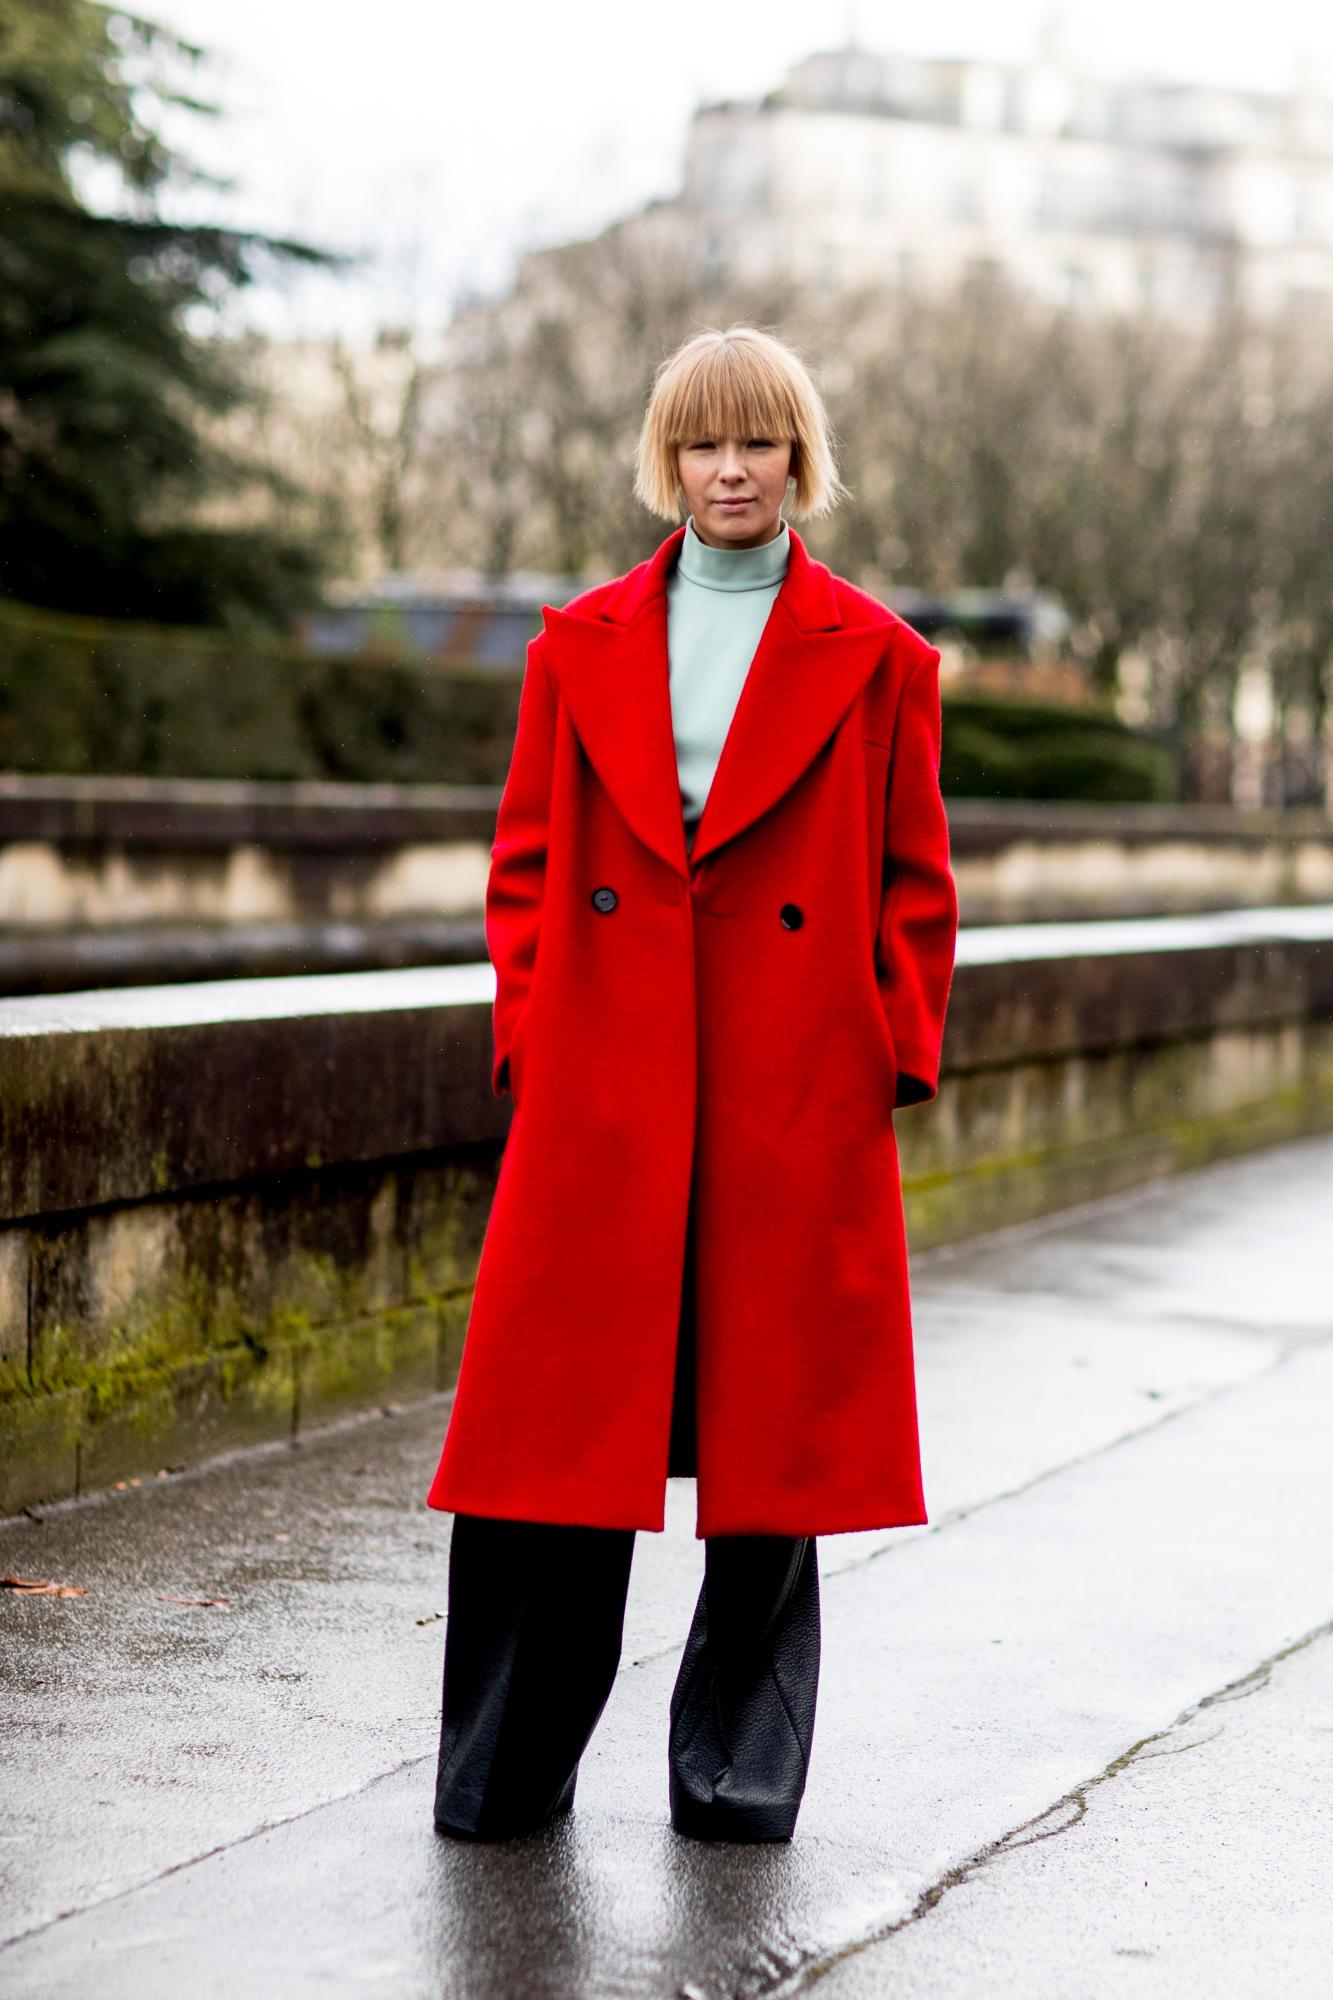 paris-fashion-week-street-style-fall-2018-day-6-31.jpg